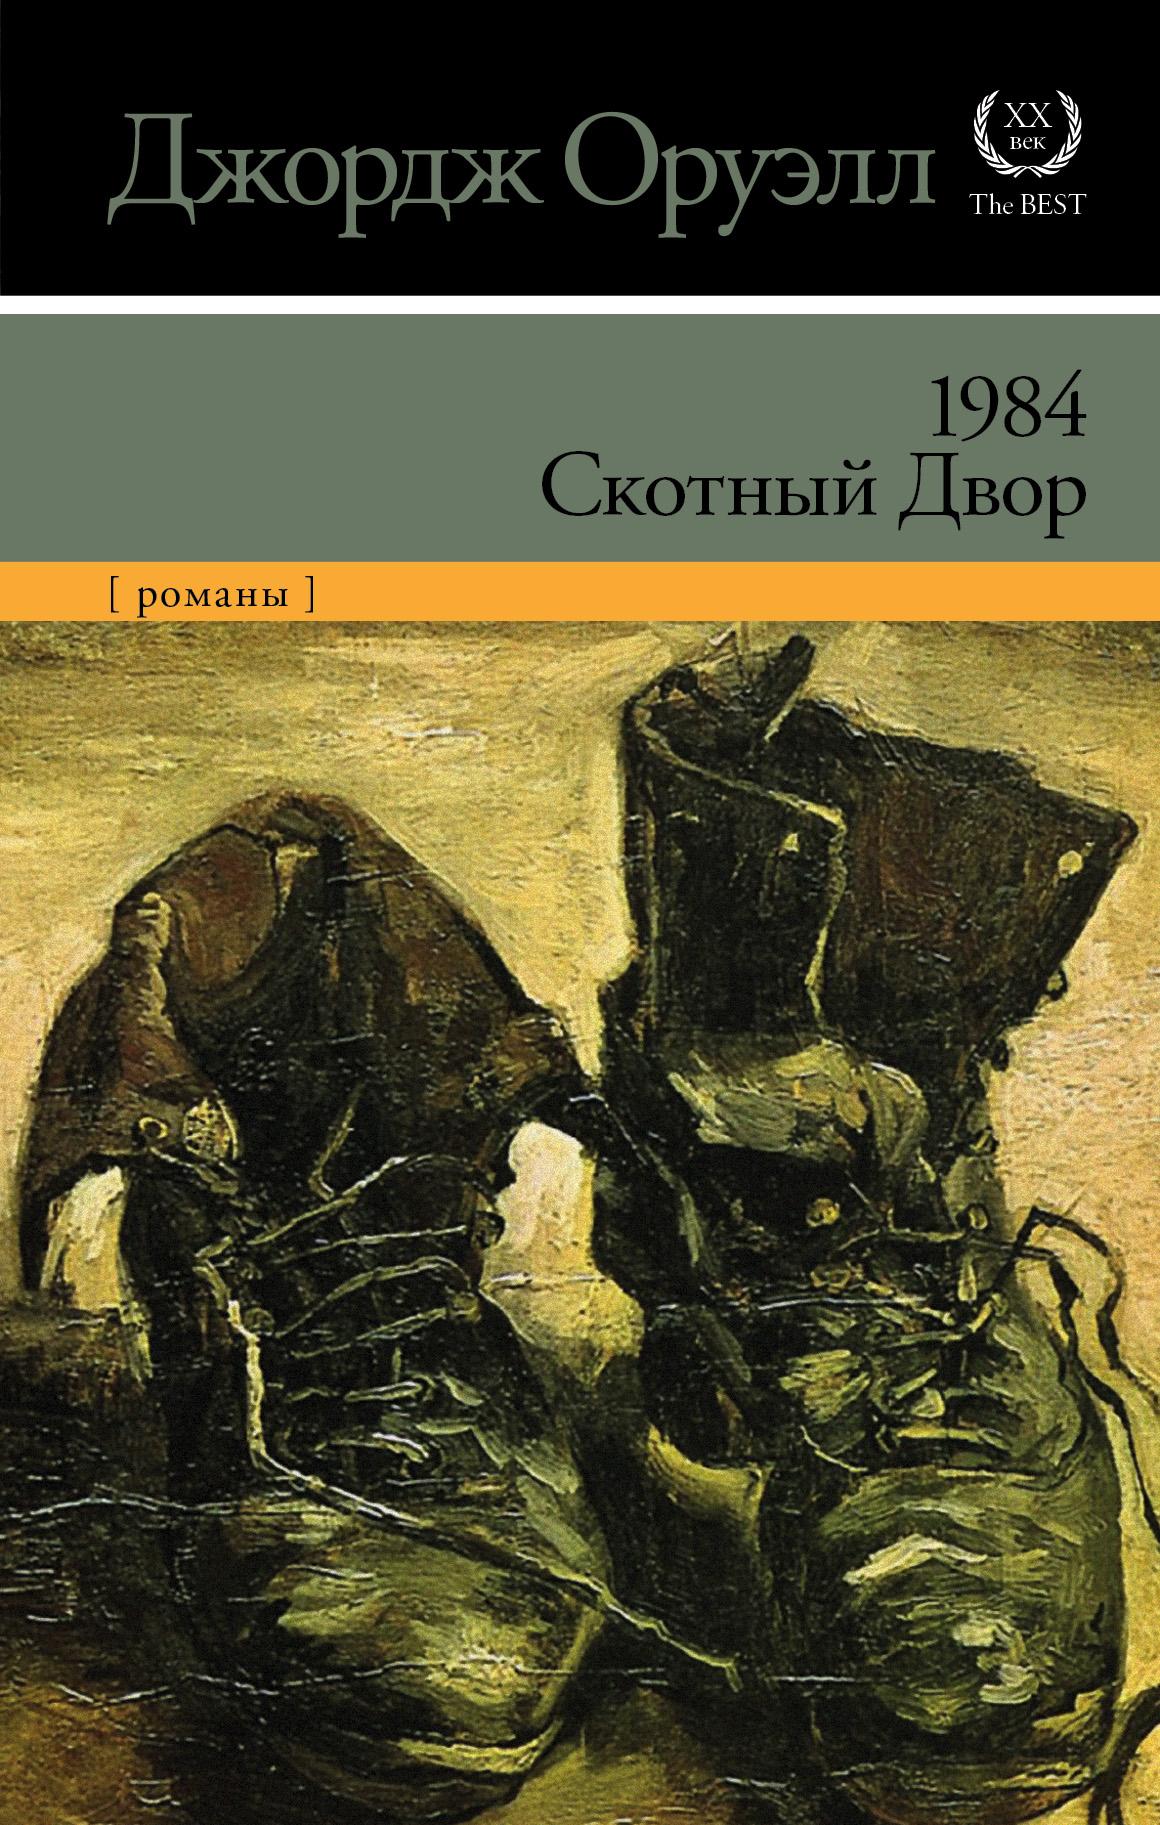 Джордж Оруэлл 1984. Скотный двор (сборник) джордж оруэлл 1984 скотный двор